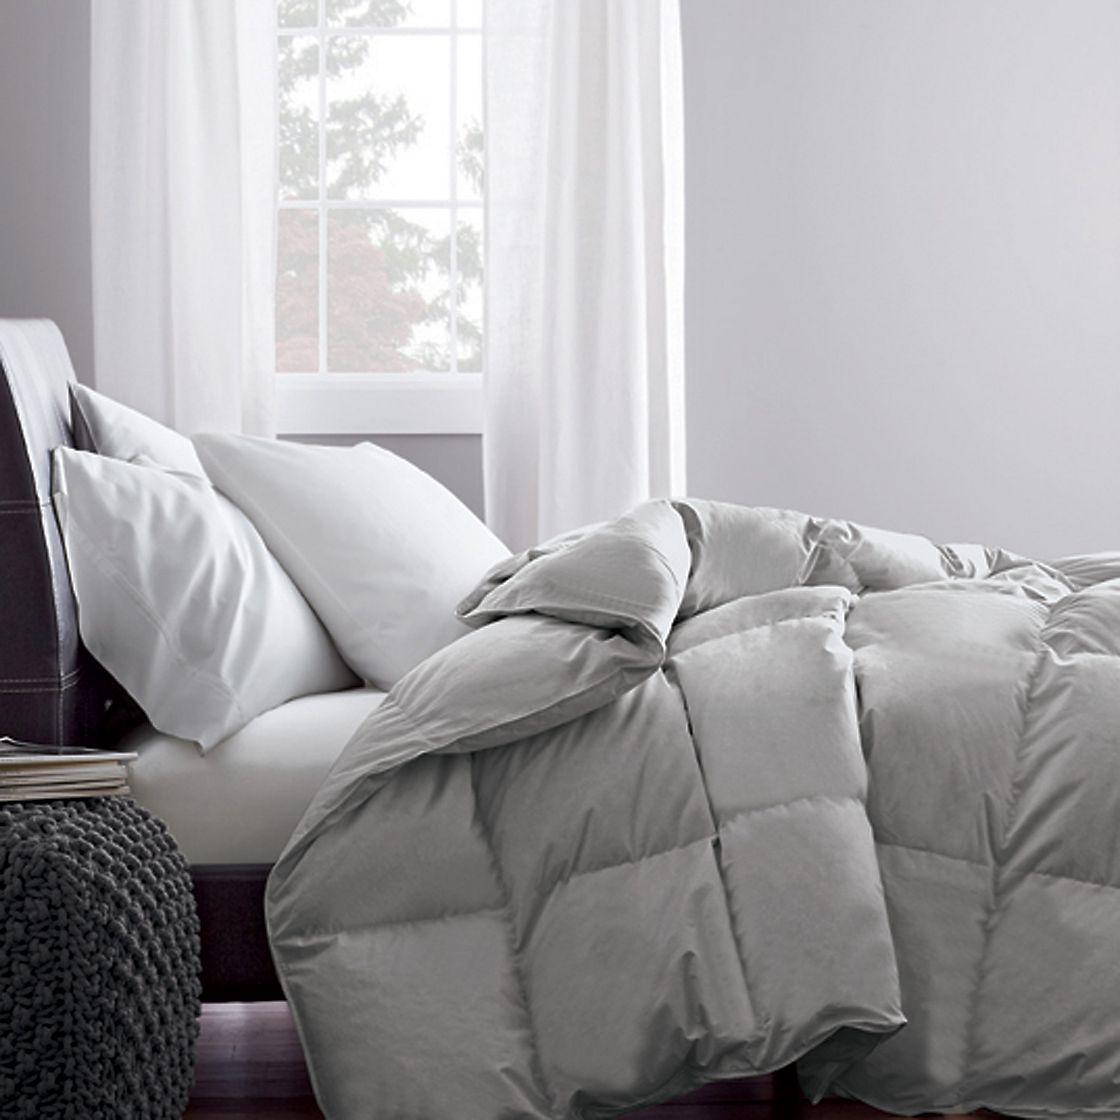 Alberta™ Oversized Baffled European Down Comforter | Size: King, Warmth: Medium, Color: Silver Gray